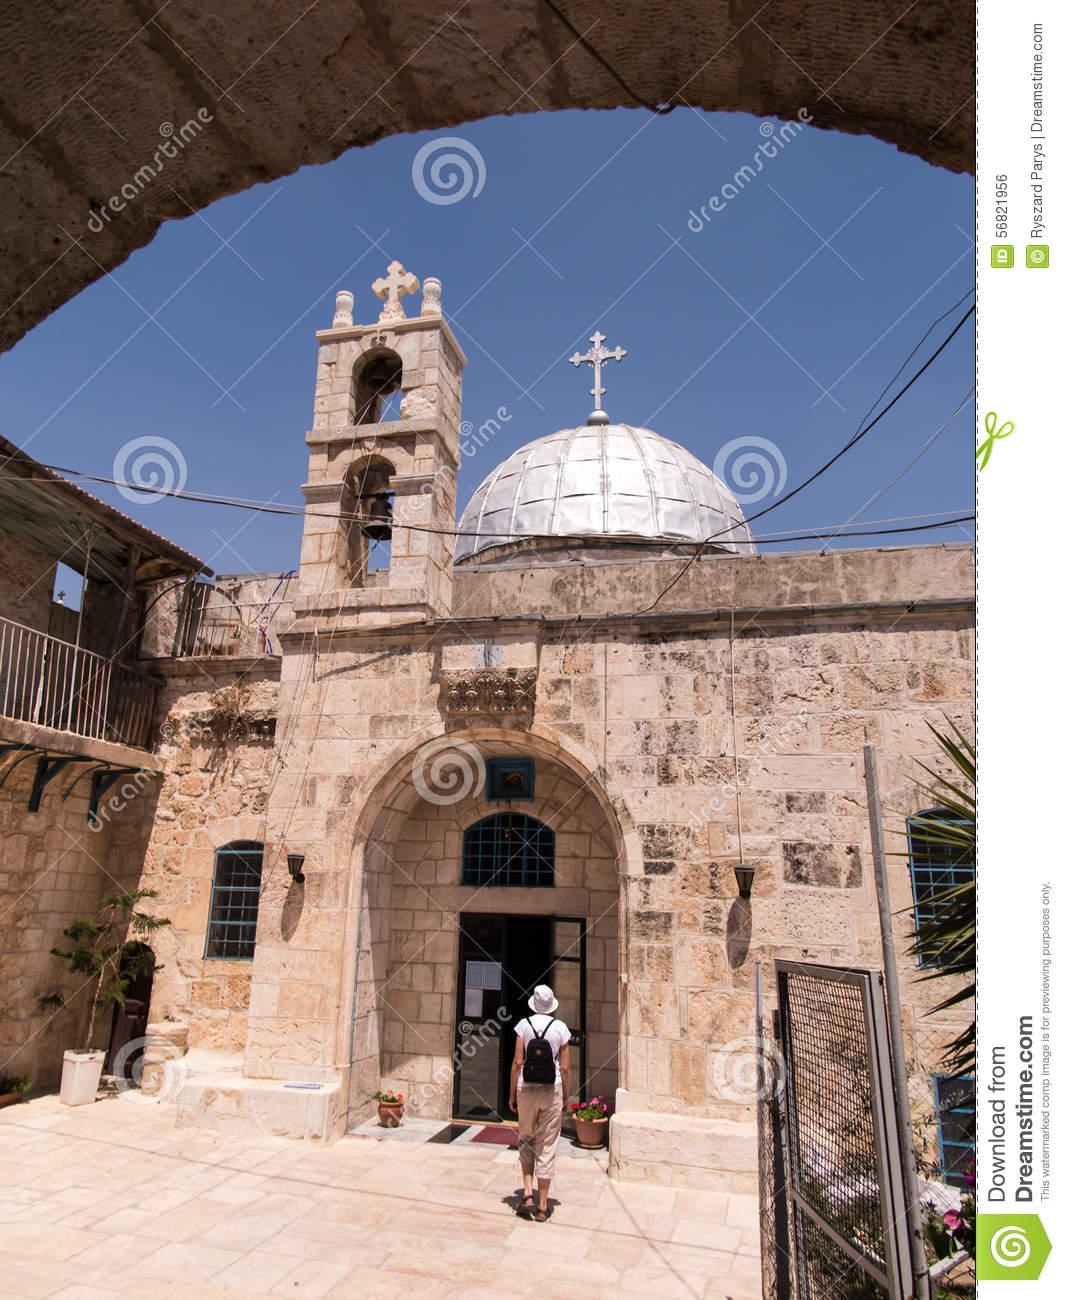 Orthodox Church Of St. John The Baptist In Old Jerusalem, Israel.